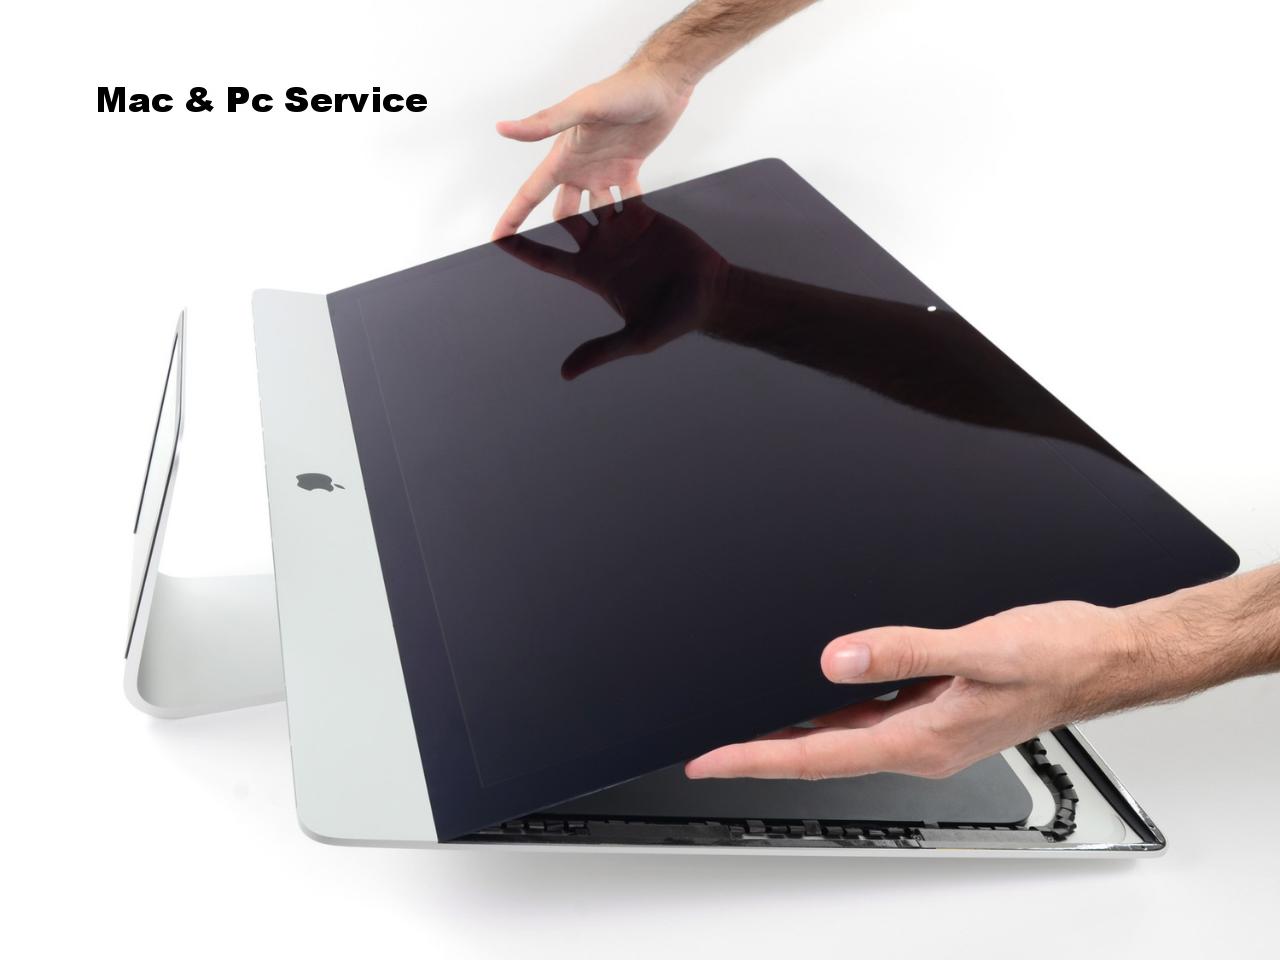 Mac & Pc Service    Call Now & Save 20% (484-202-0260)